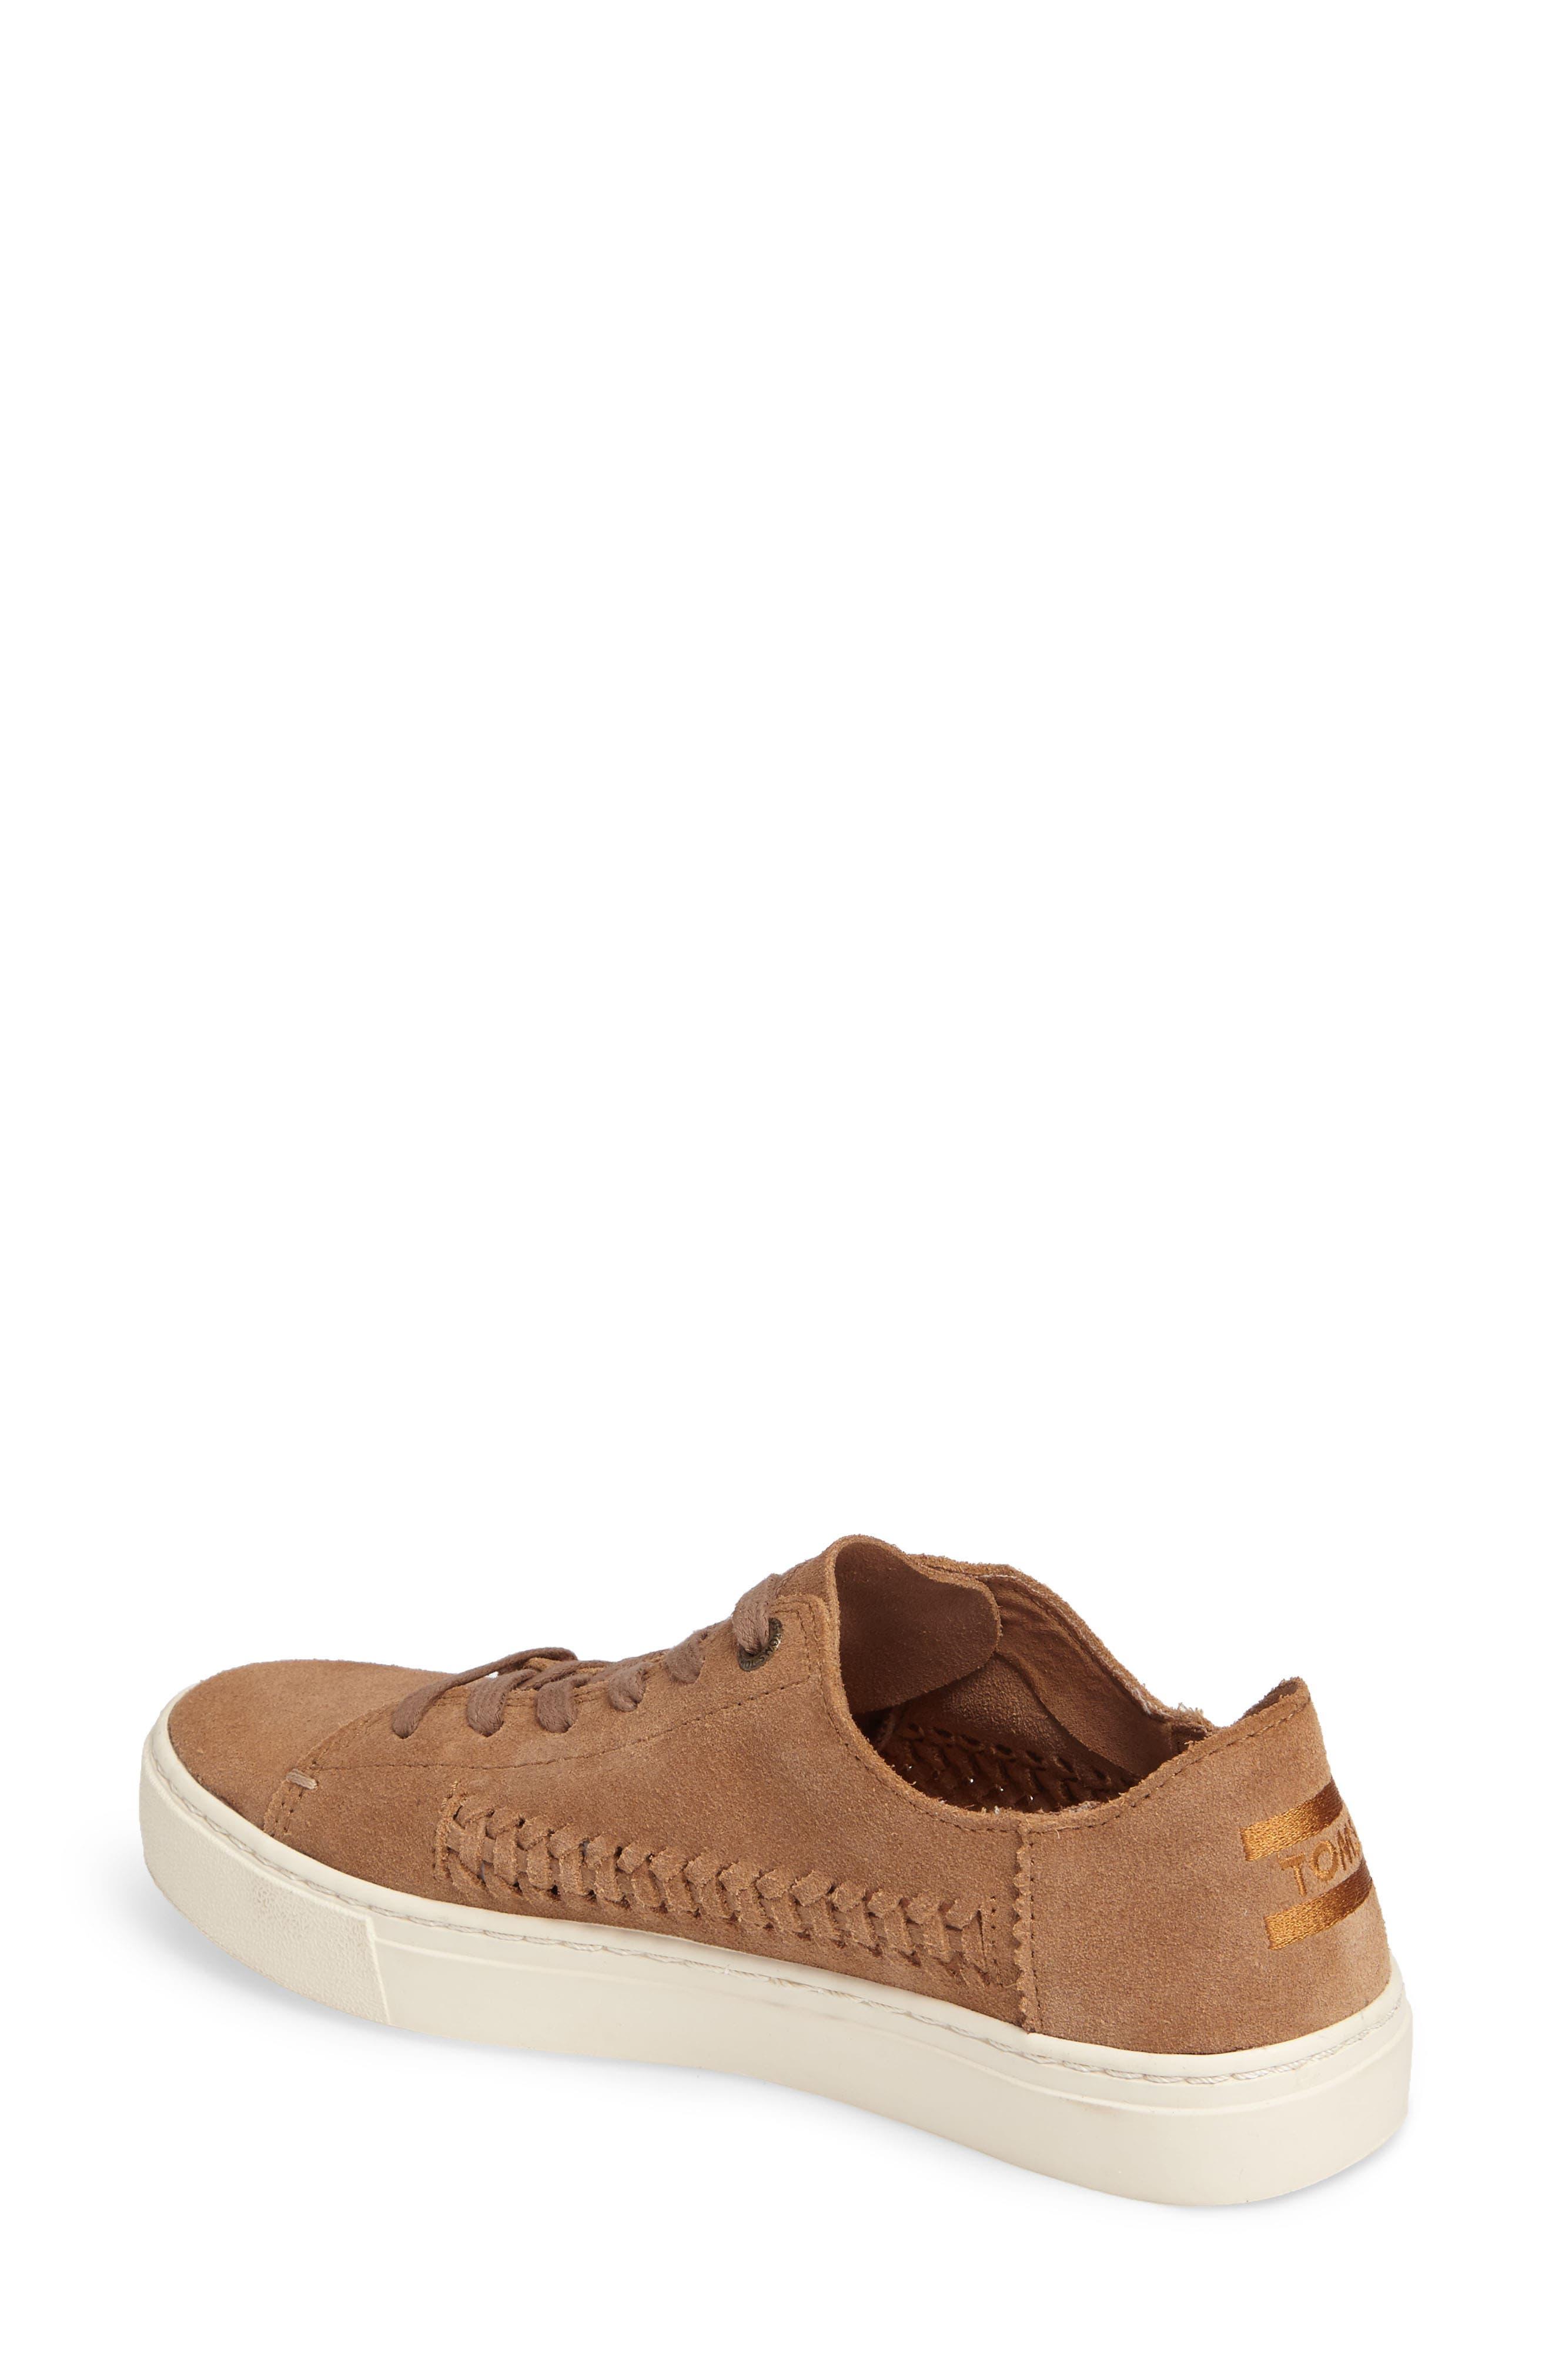 Lenox Sneaker,                             Alternate thumbnail 25, color,